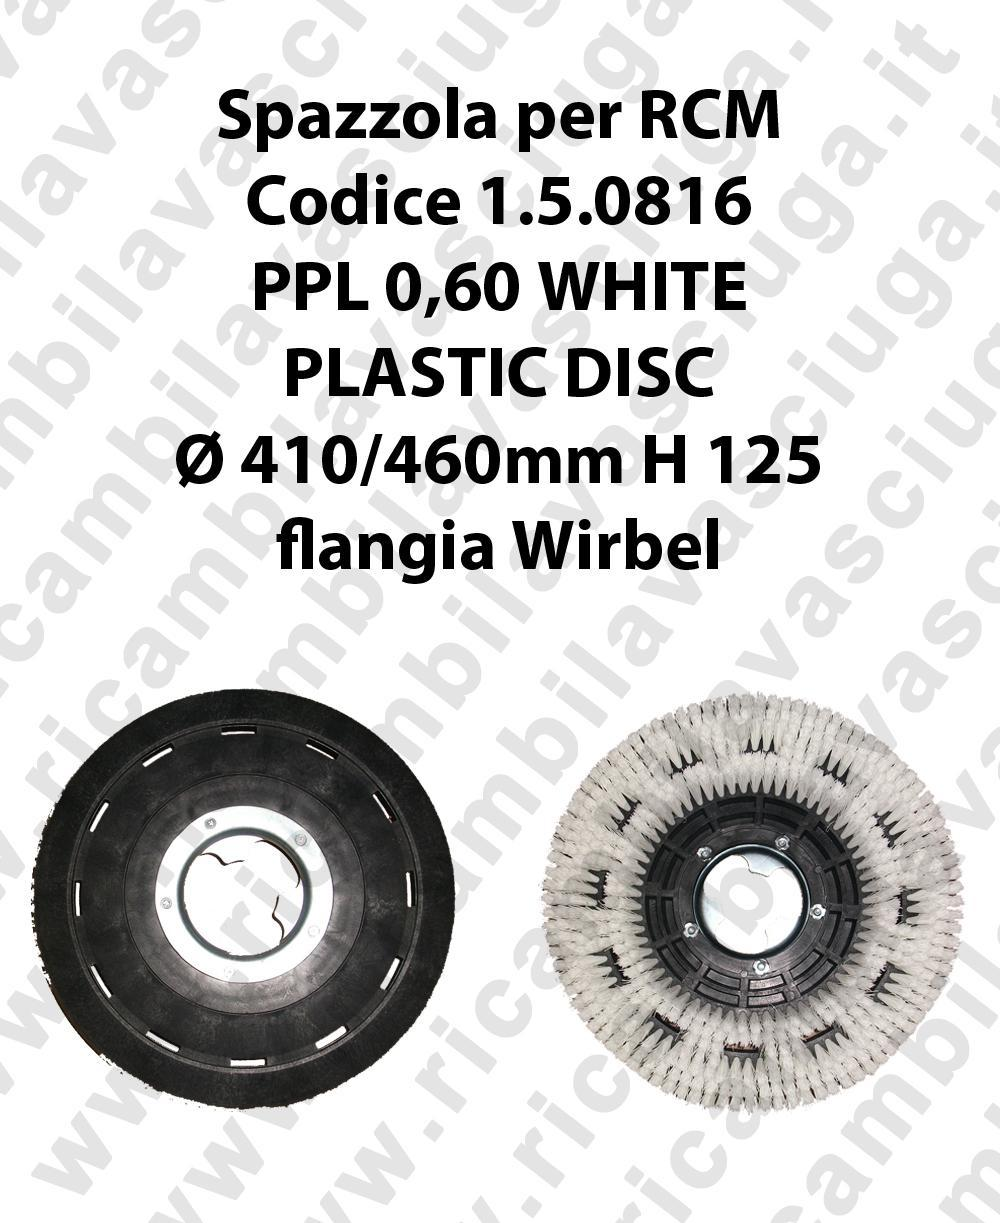 CEPILLO DE LAVADO PPL 0.6 WHITE para fregadora RCM codice 1.5.0816